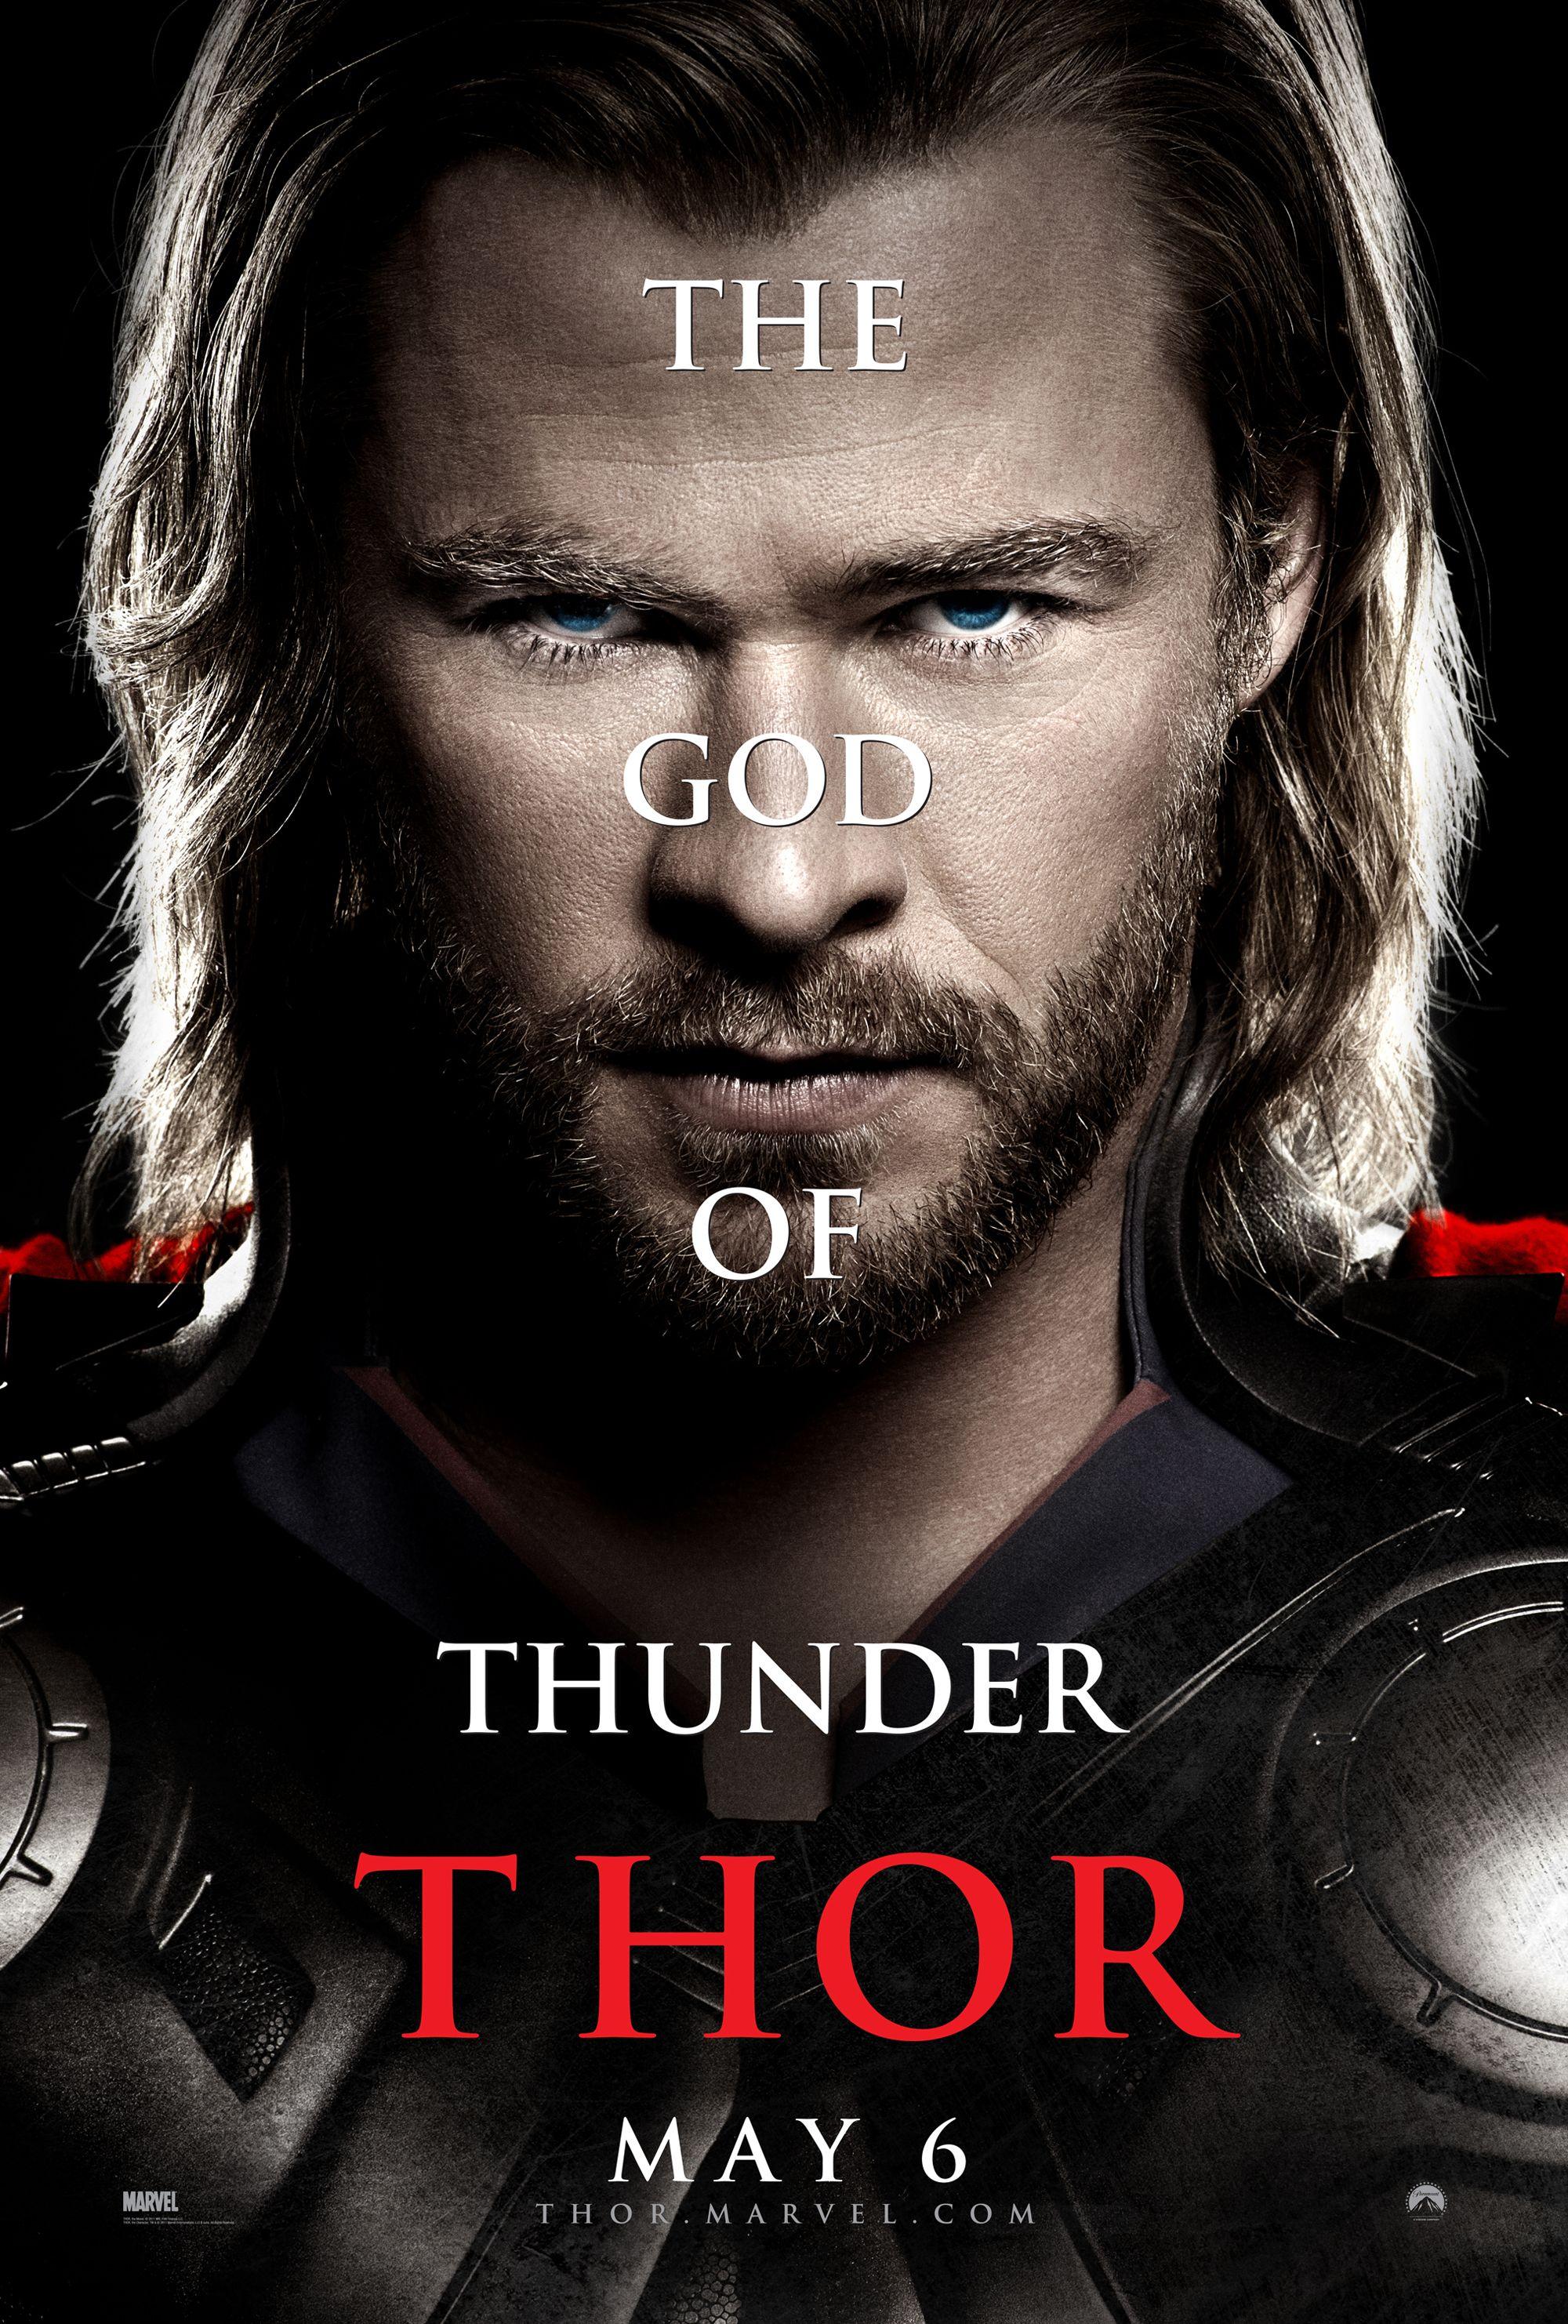 thor movie poster. Thor movie poster.jpg